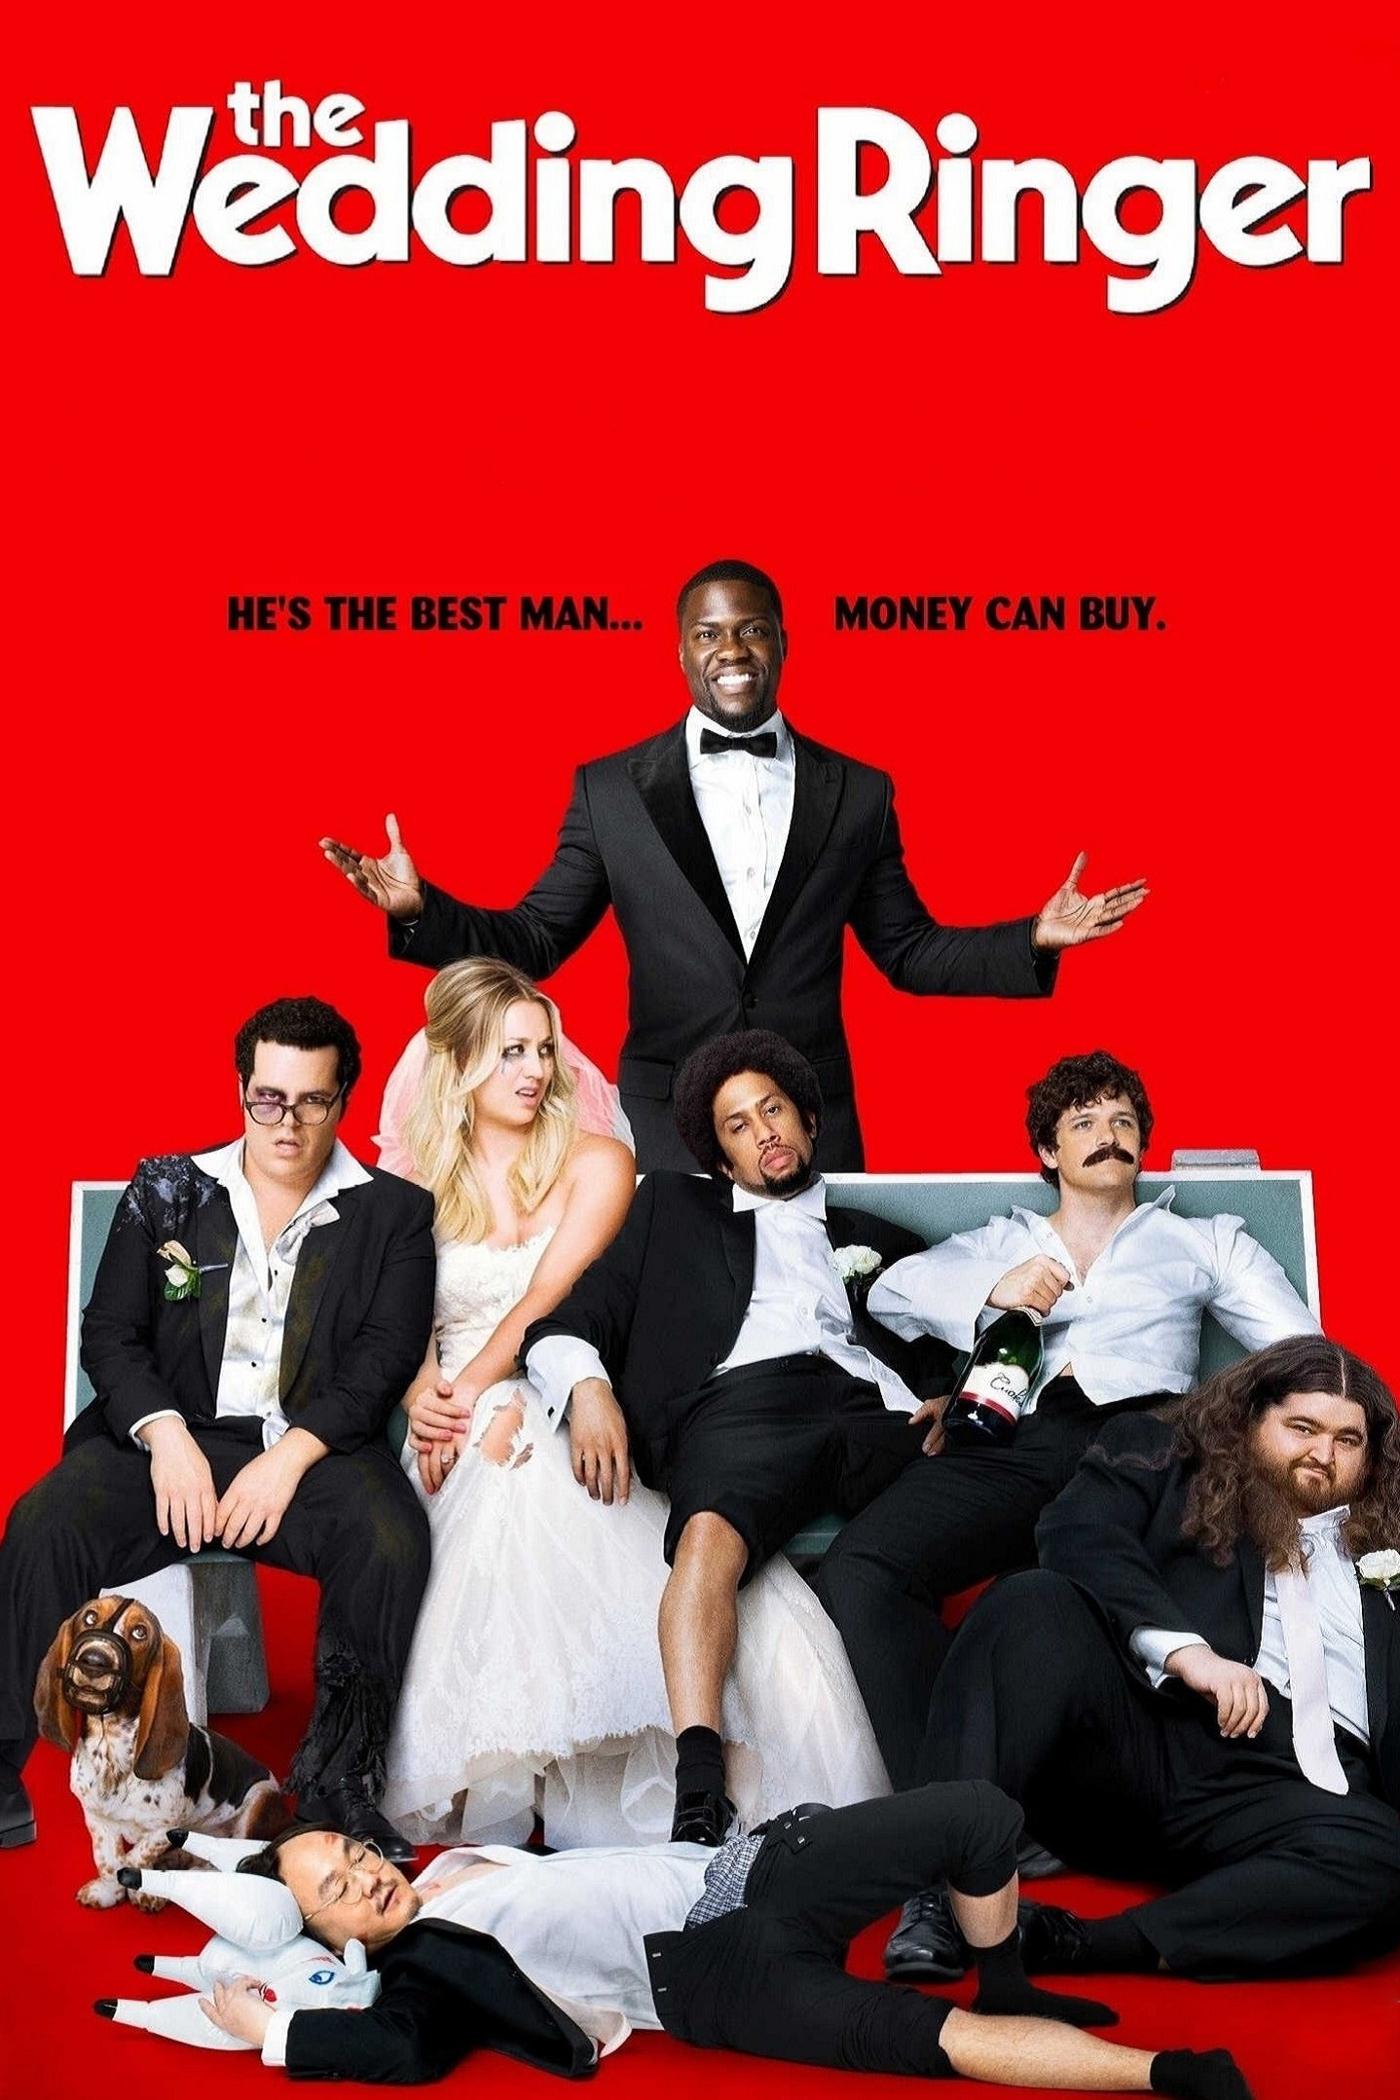 Ver The Wedding Ringer 2015 Online HD Español Lati 1 year, 5 months ...